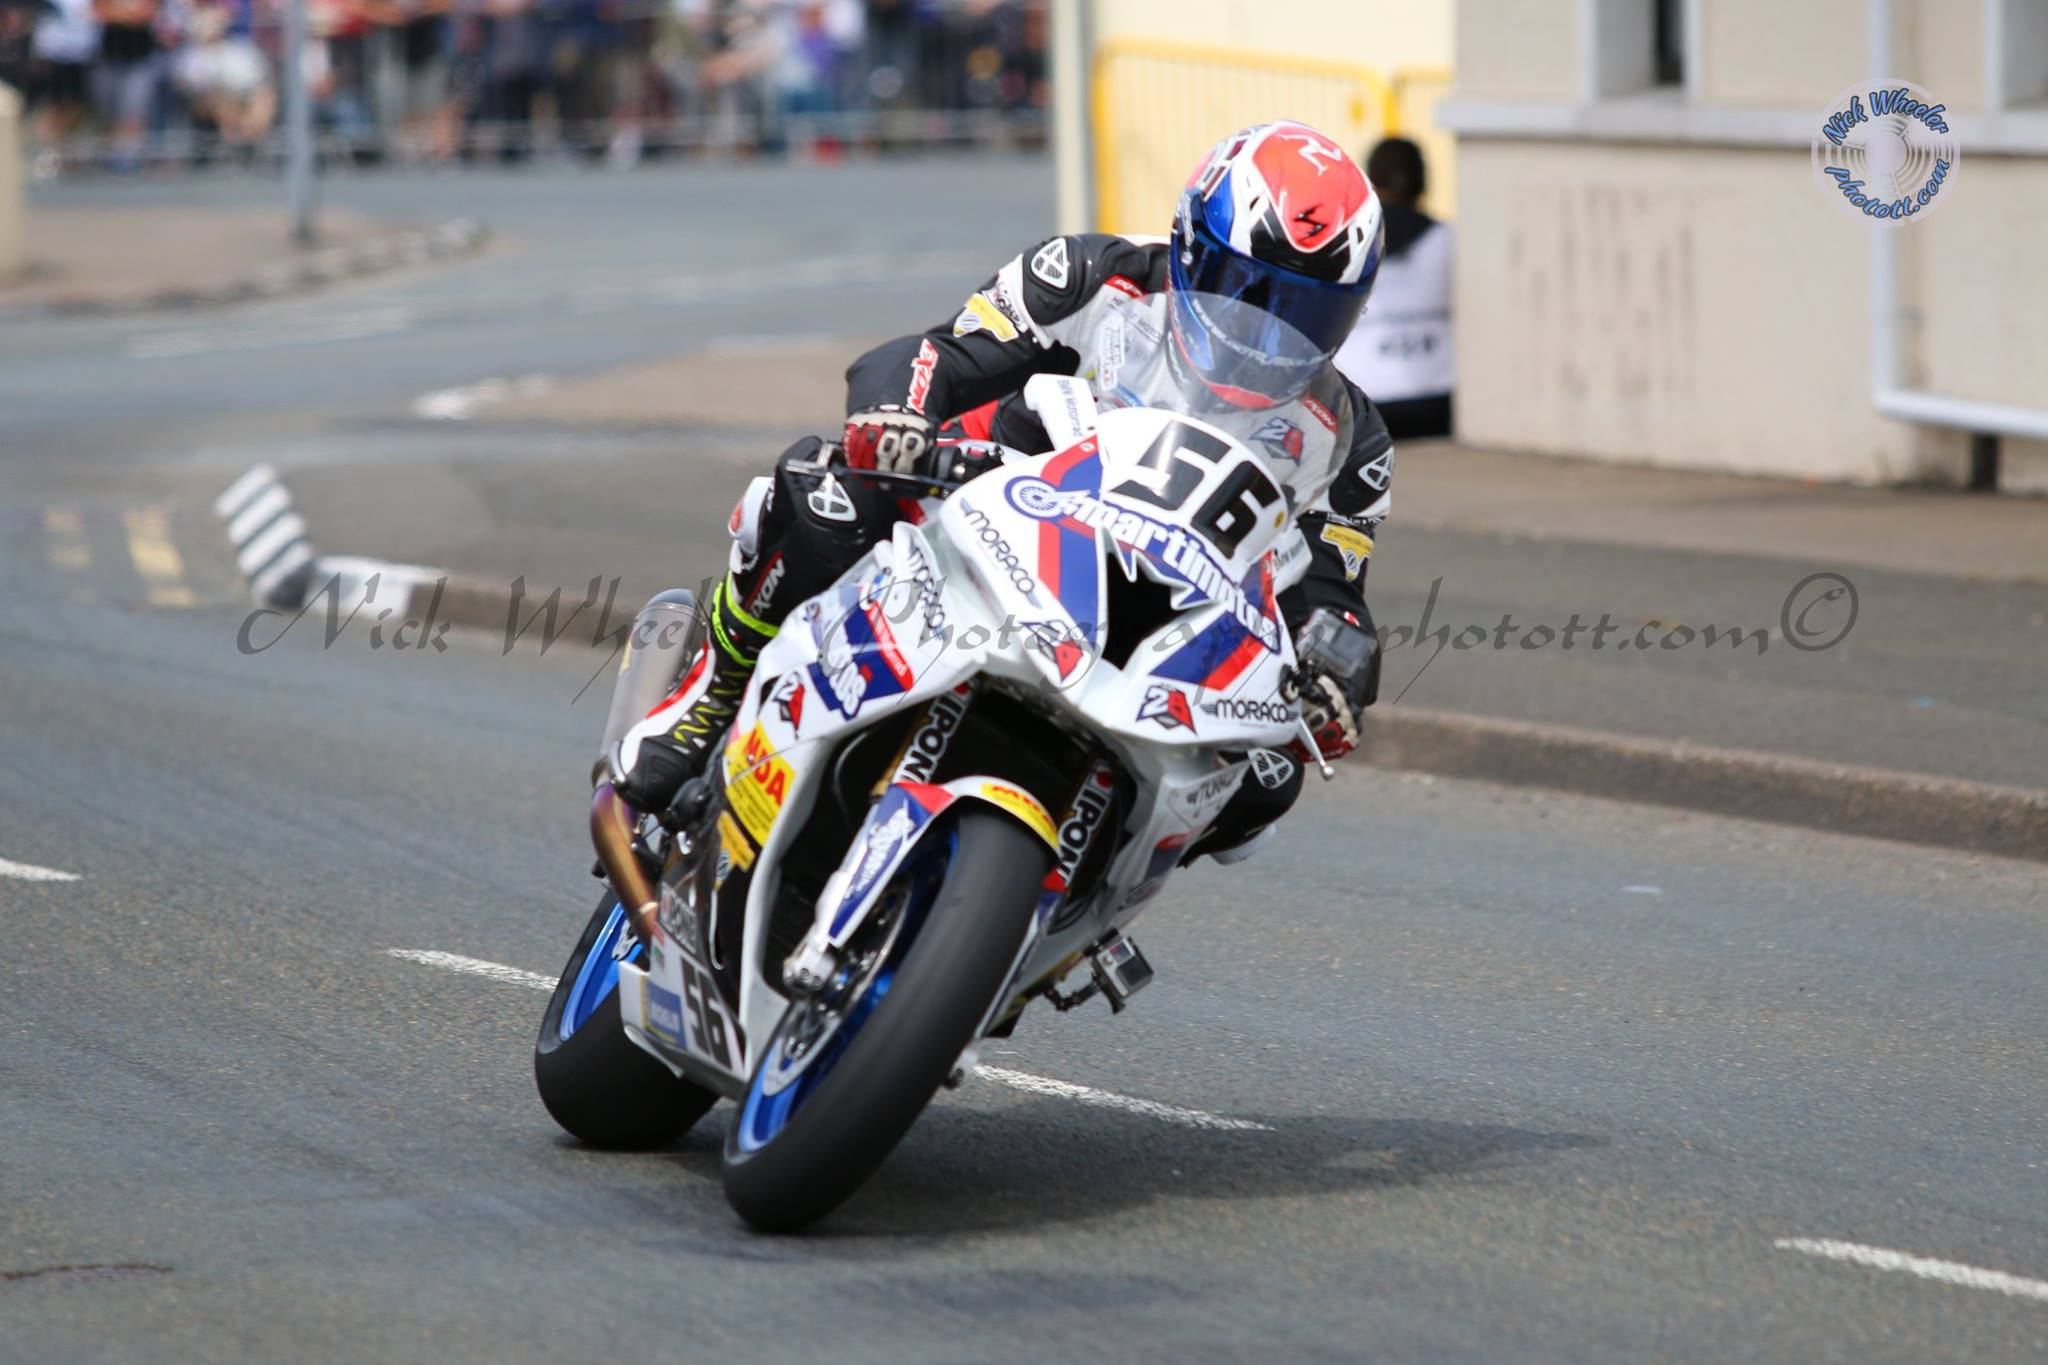 TT 2018: Future Dakar Rally Participant Toniutti Bags Top 25 Finishes In Big Bike Encounters